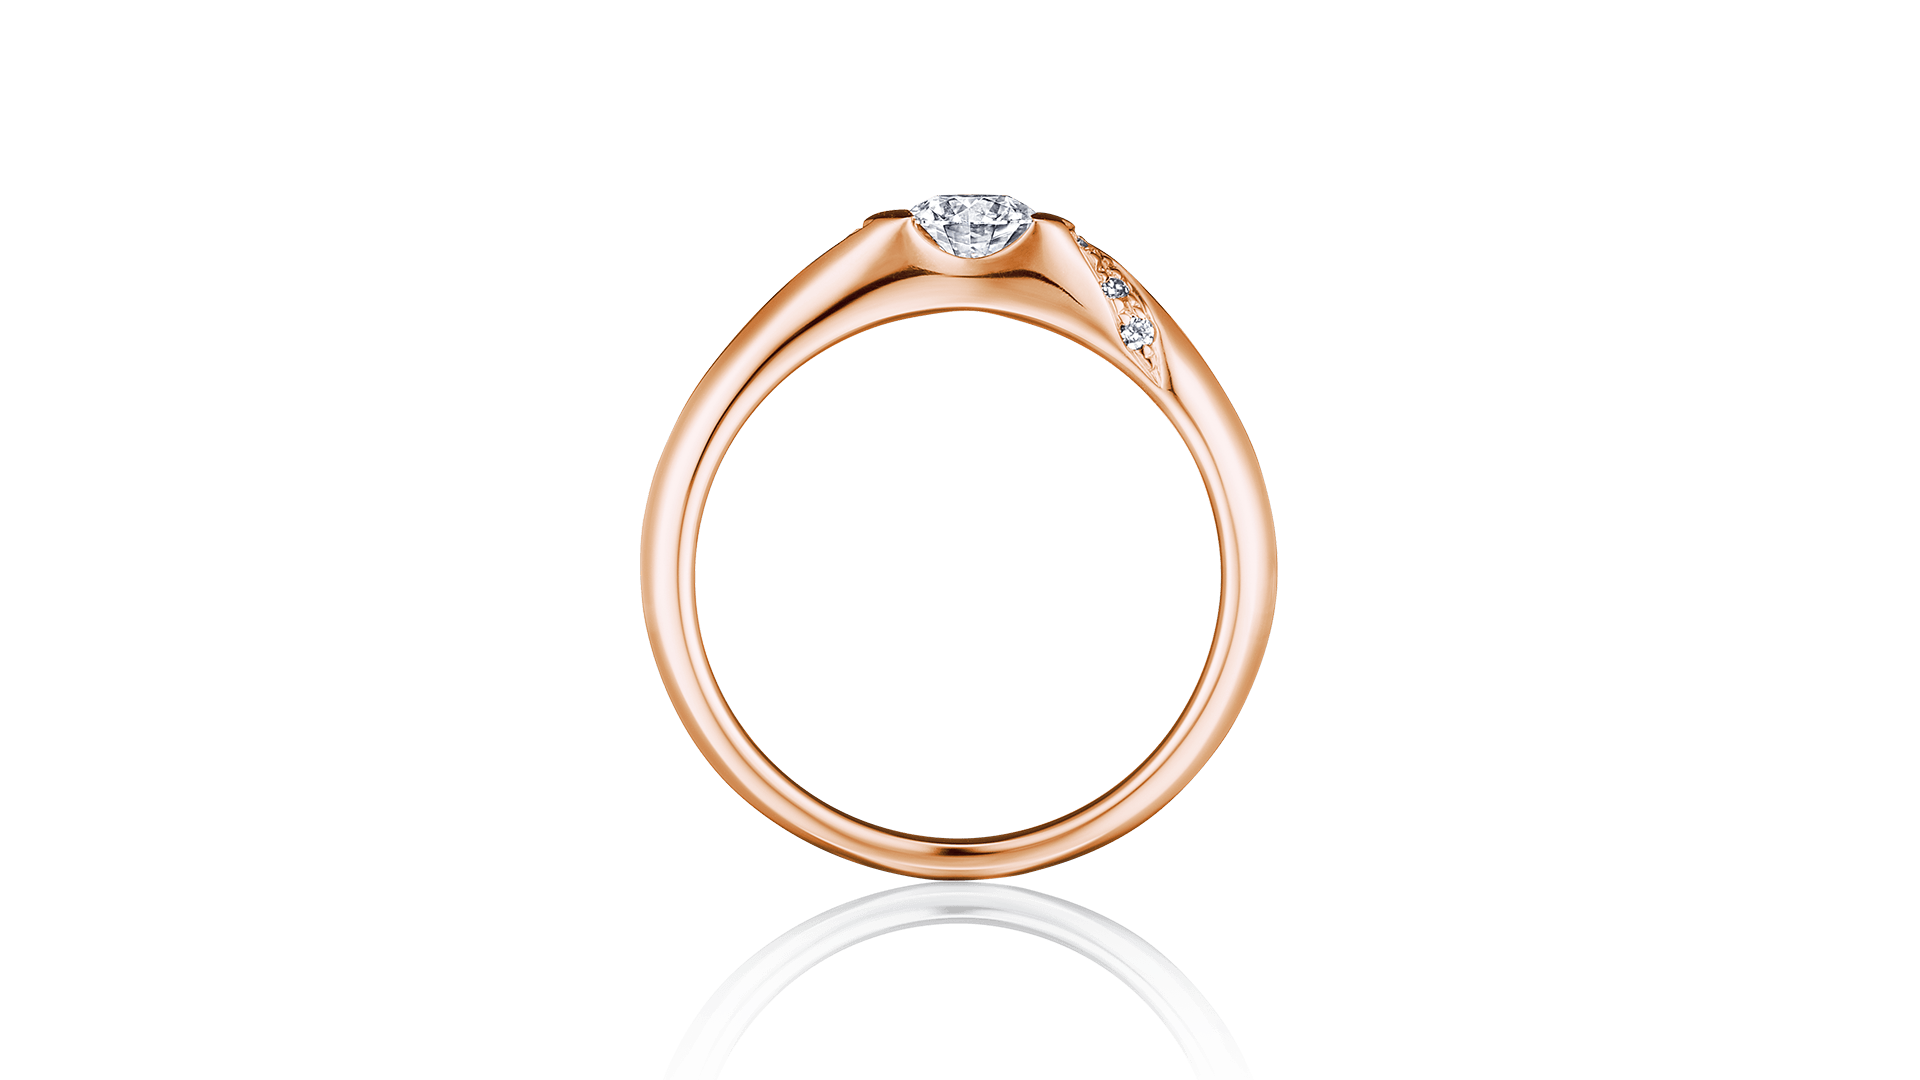 acrux アクルクス | 婚約指輪サムネイル 2